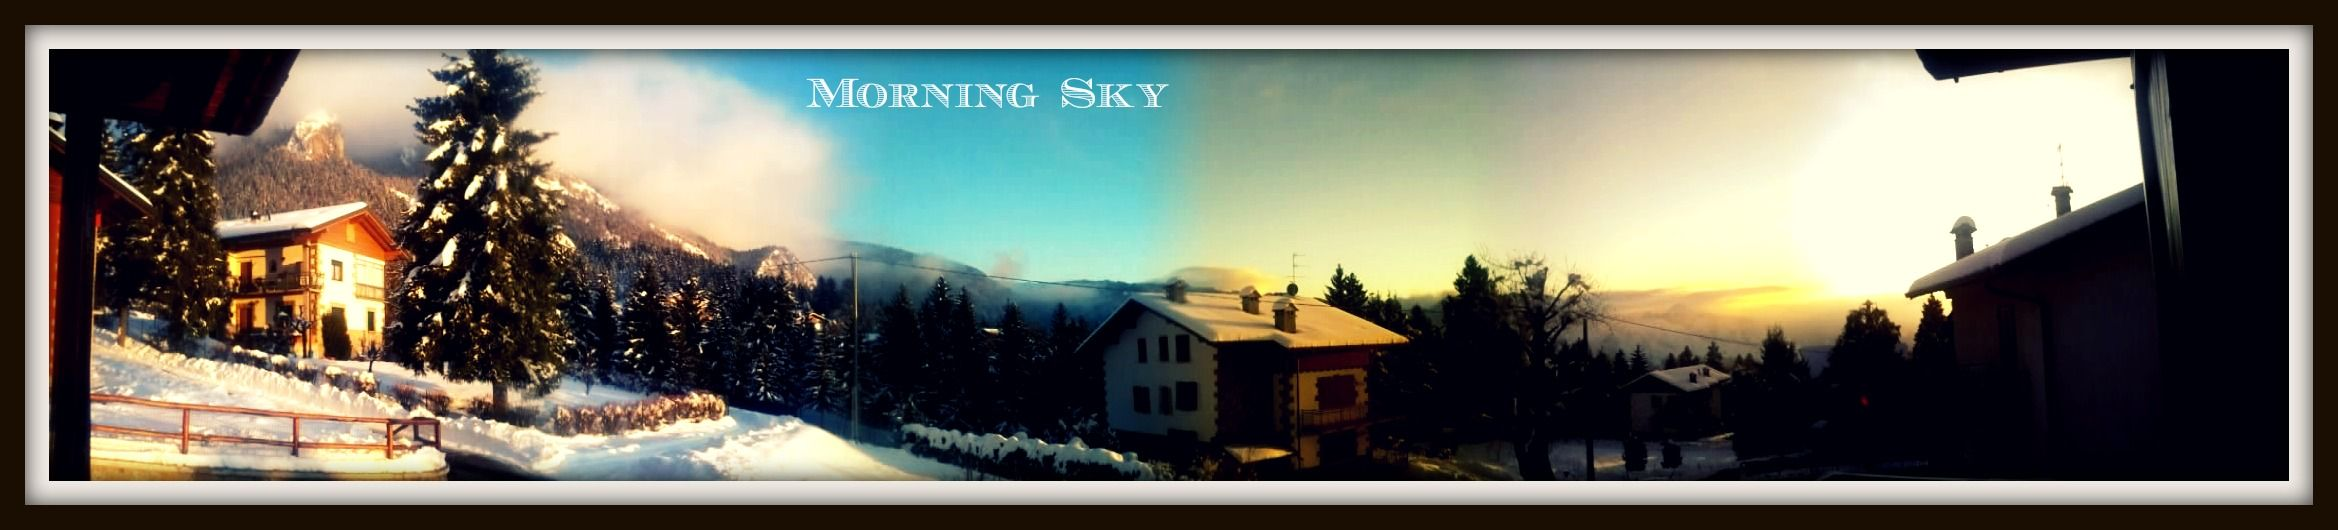 Day5: Morning Sky! (22.12.12)